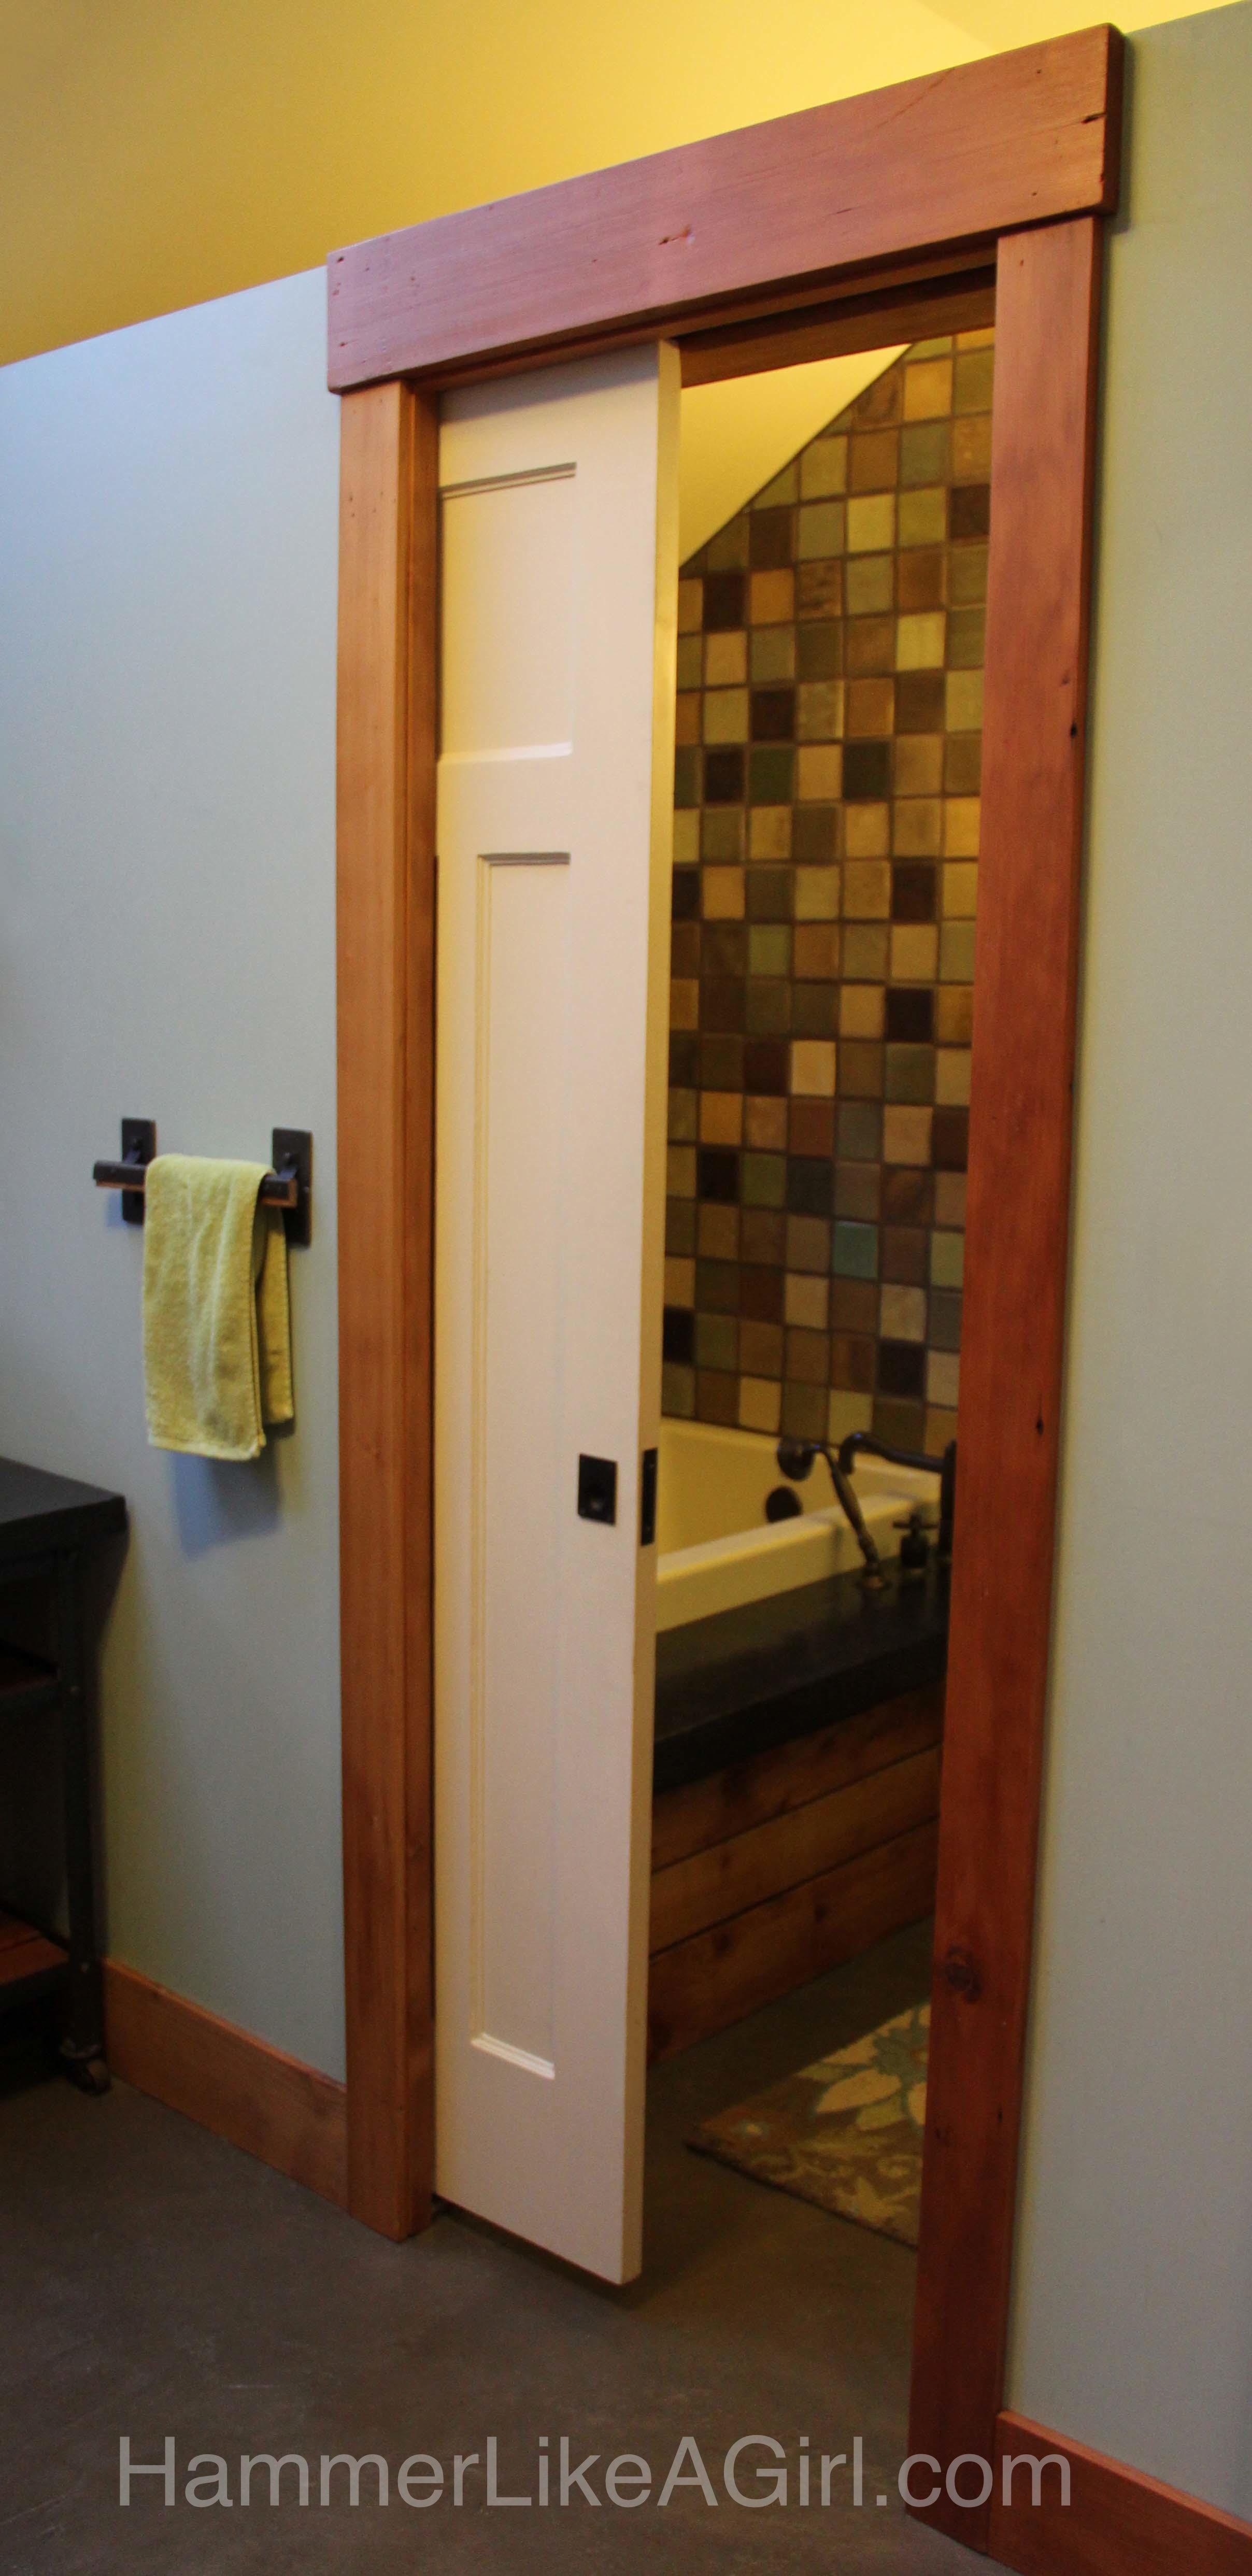 6972 Salvaged Doors As Converging Pocket Doors: Photo Of Sliding Doors  Seattle 2416 4971 #